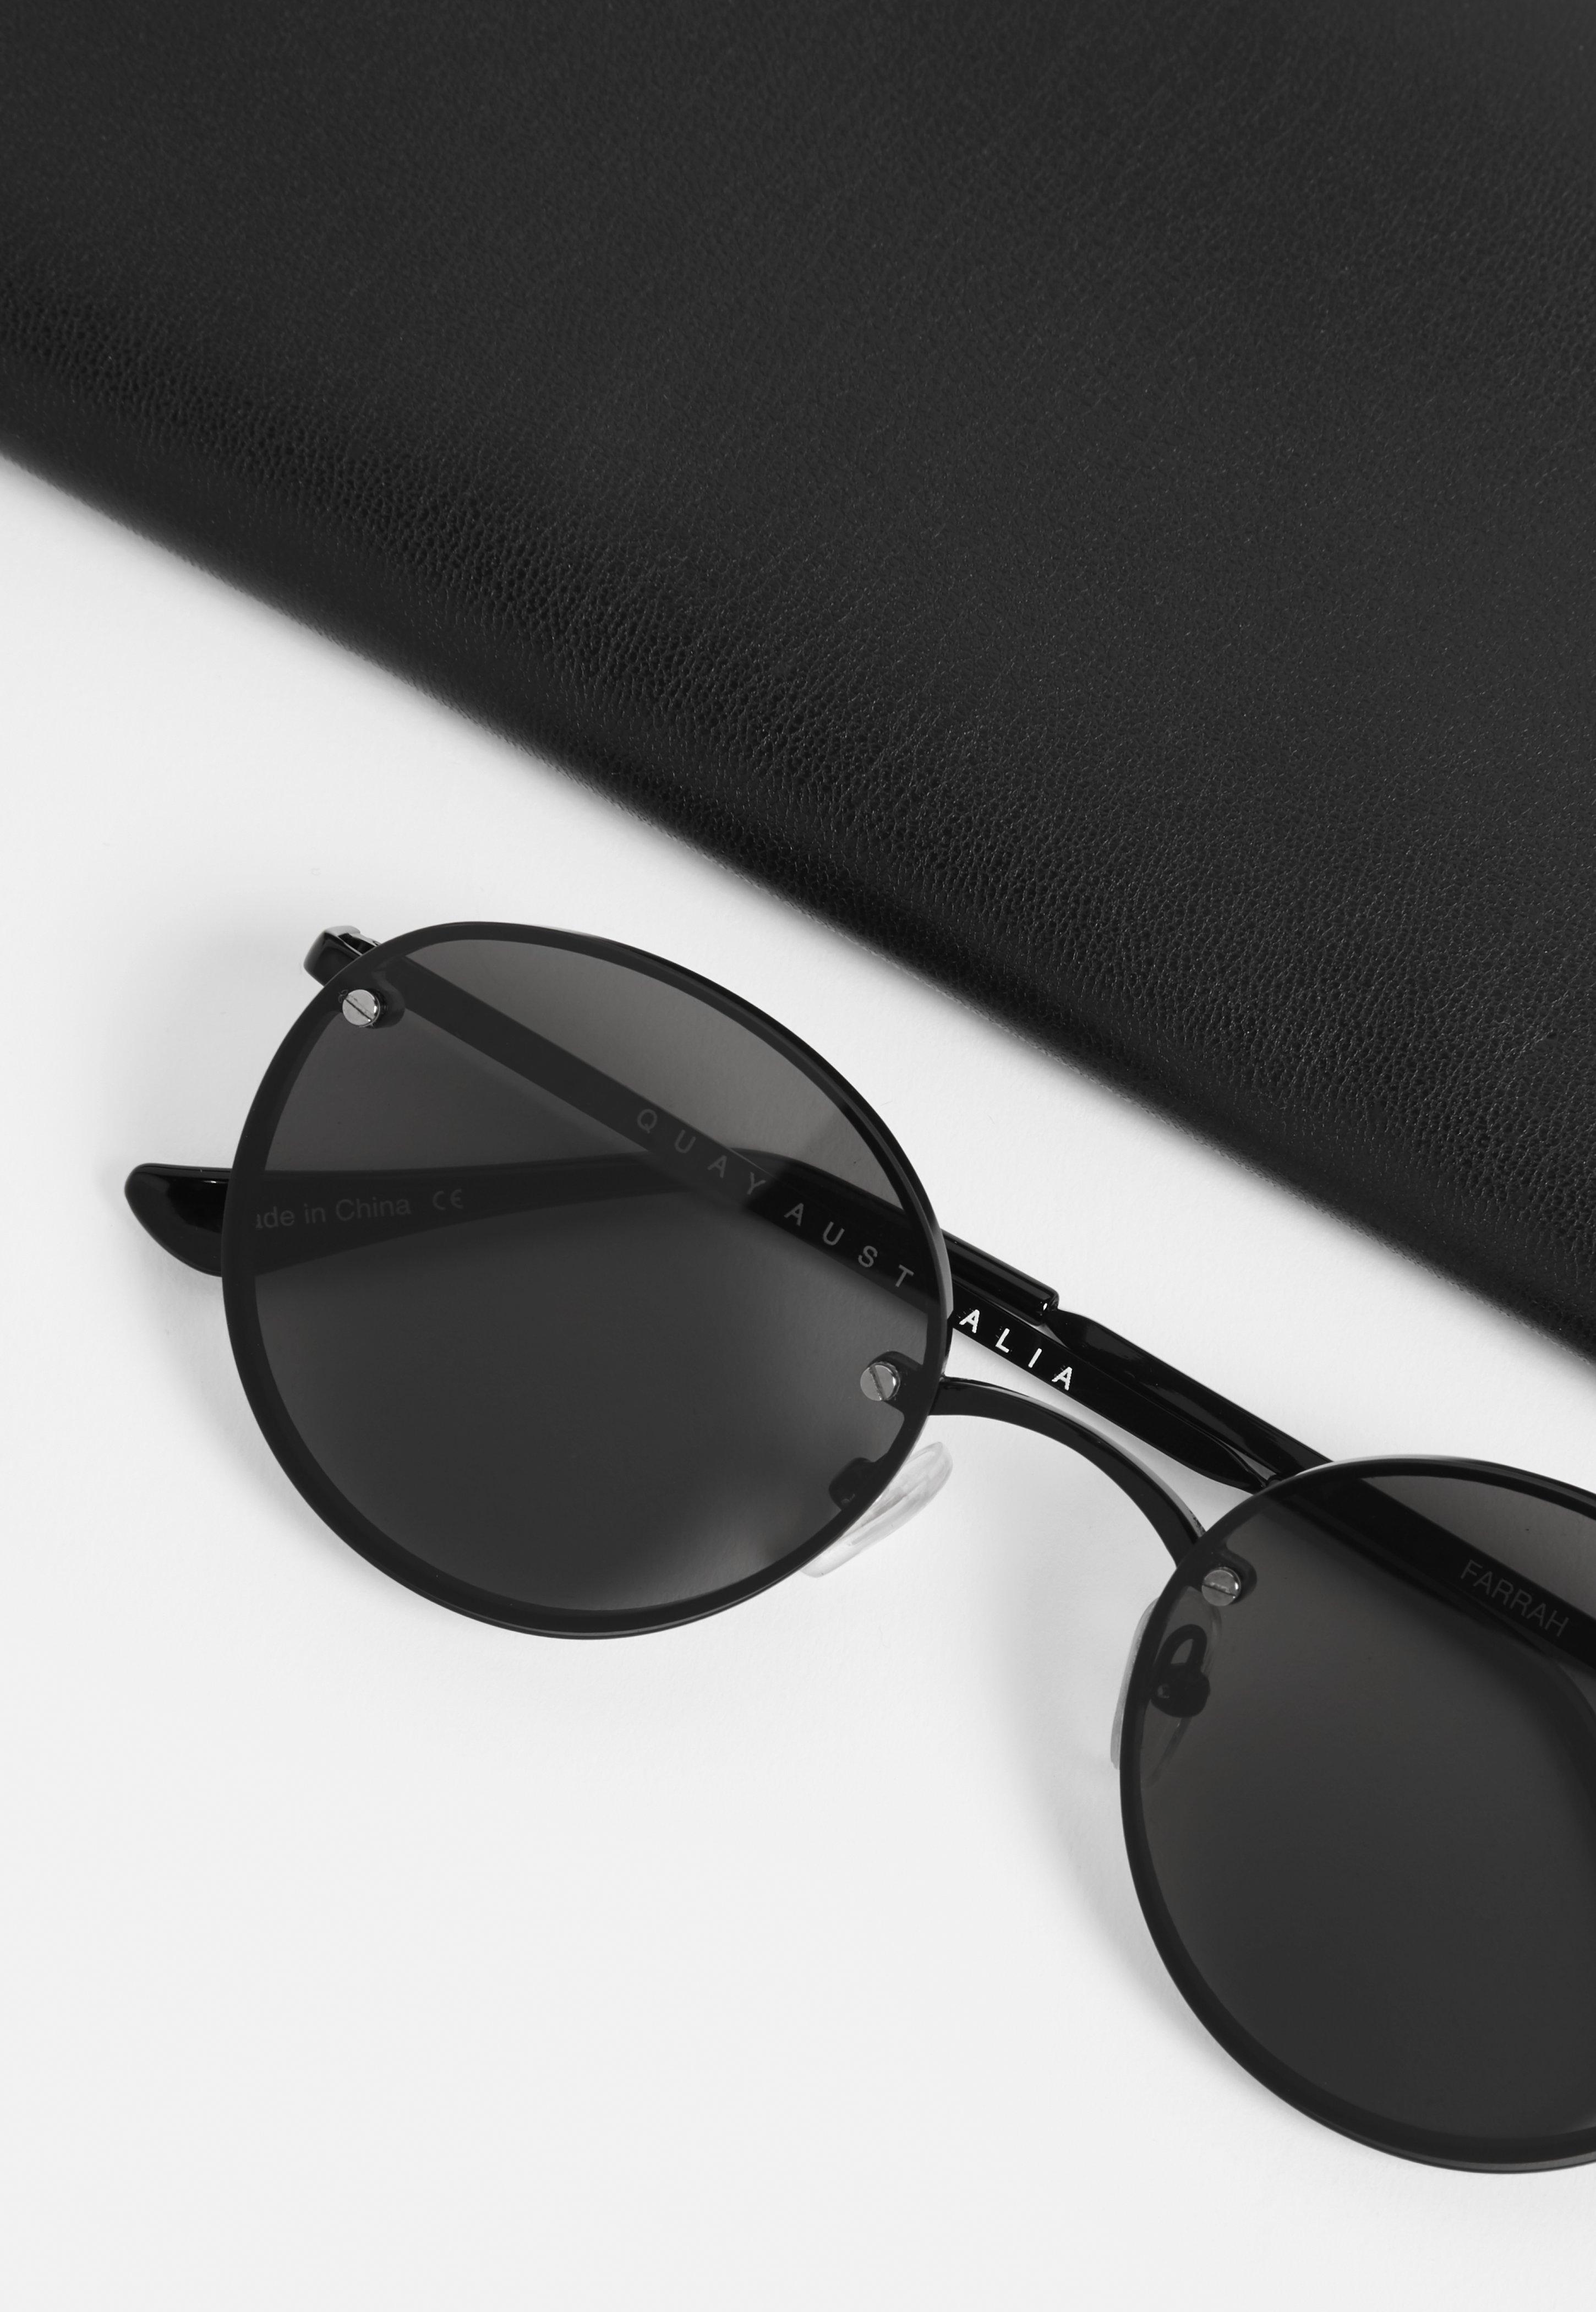 380a040ddf9b2 Missguided Quay Australia X Elle Ferguson Farrah Black Sunglasses in ...